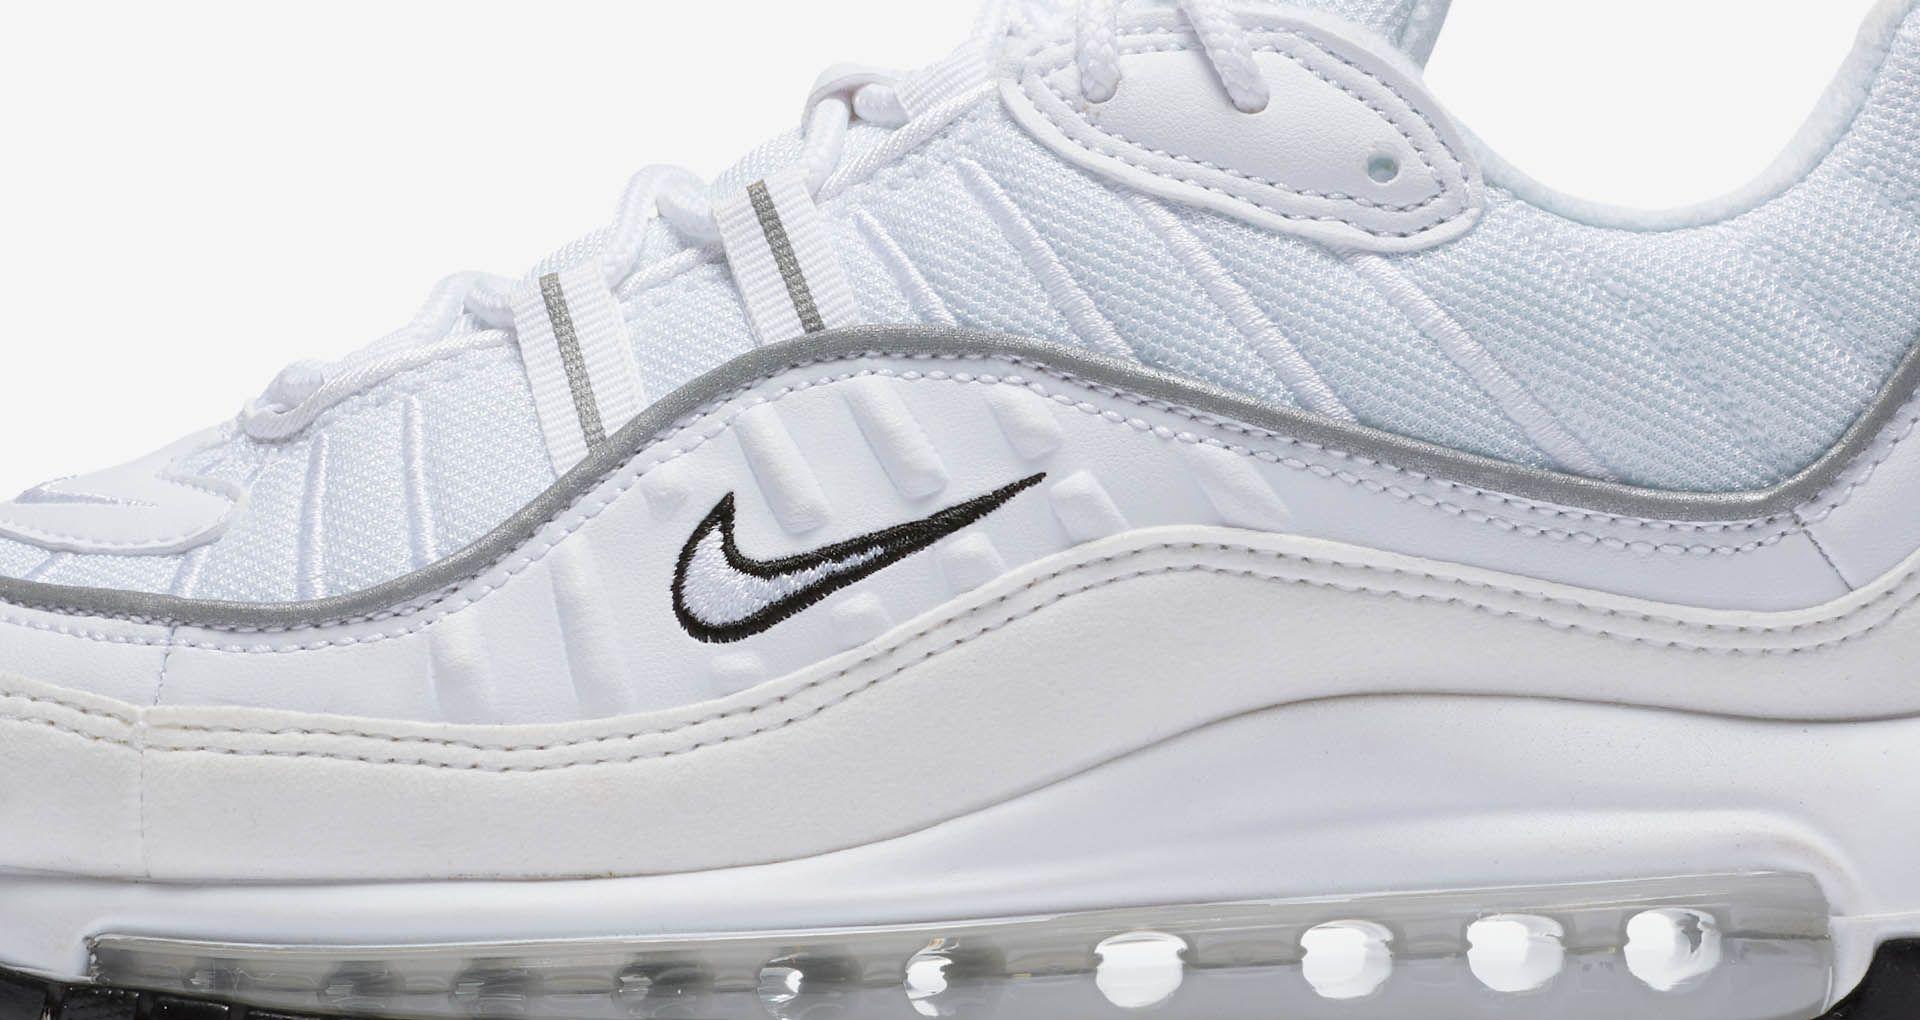 Nike Women's Air Max 98 'White & Reflective Silver